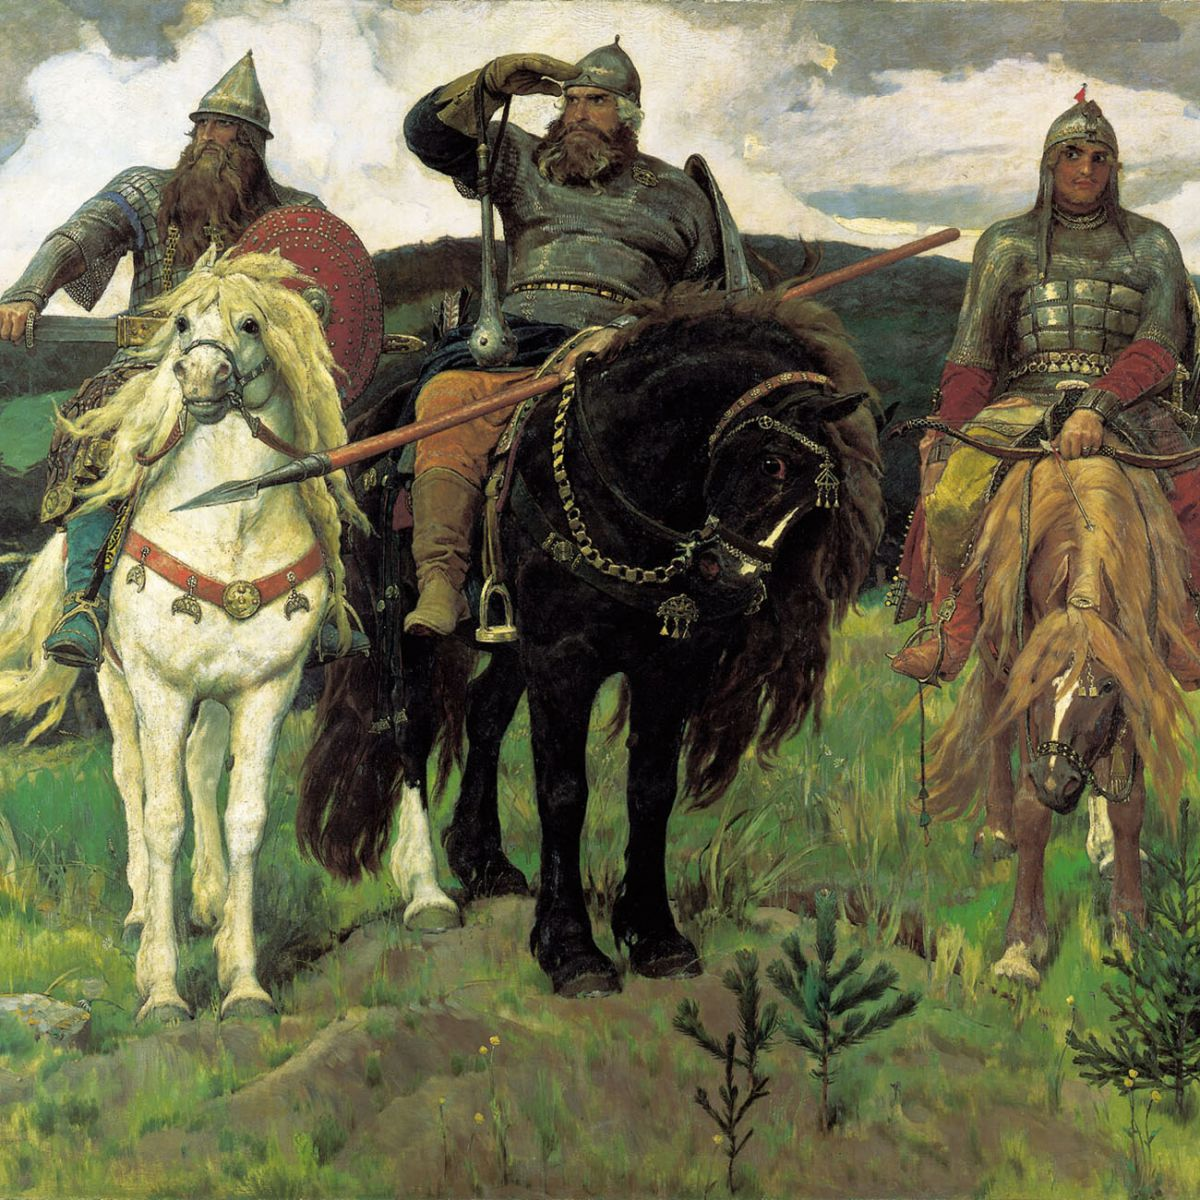 История создания картины богатыри ...: pictures11.ru/istoriya-sozdaniya-kartiny-bogatyri.html